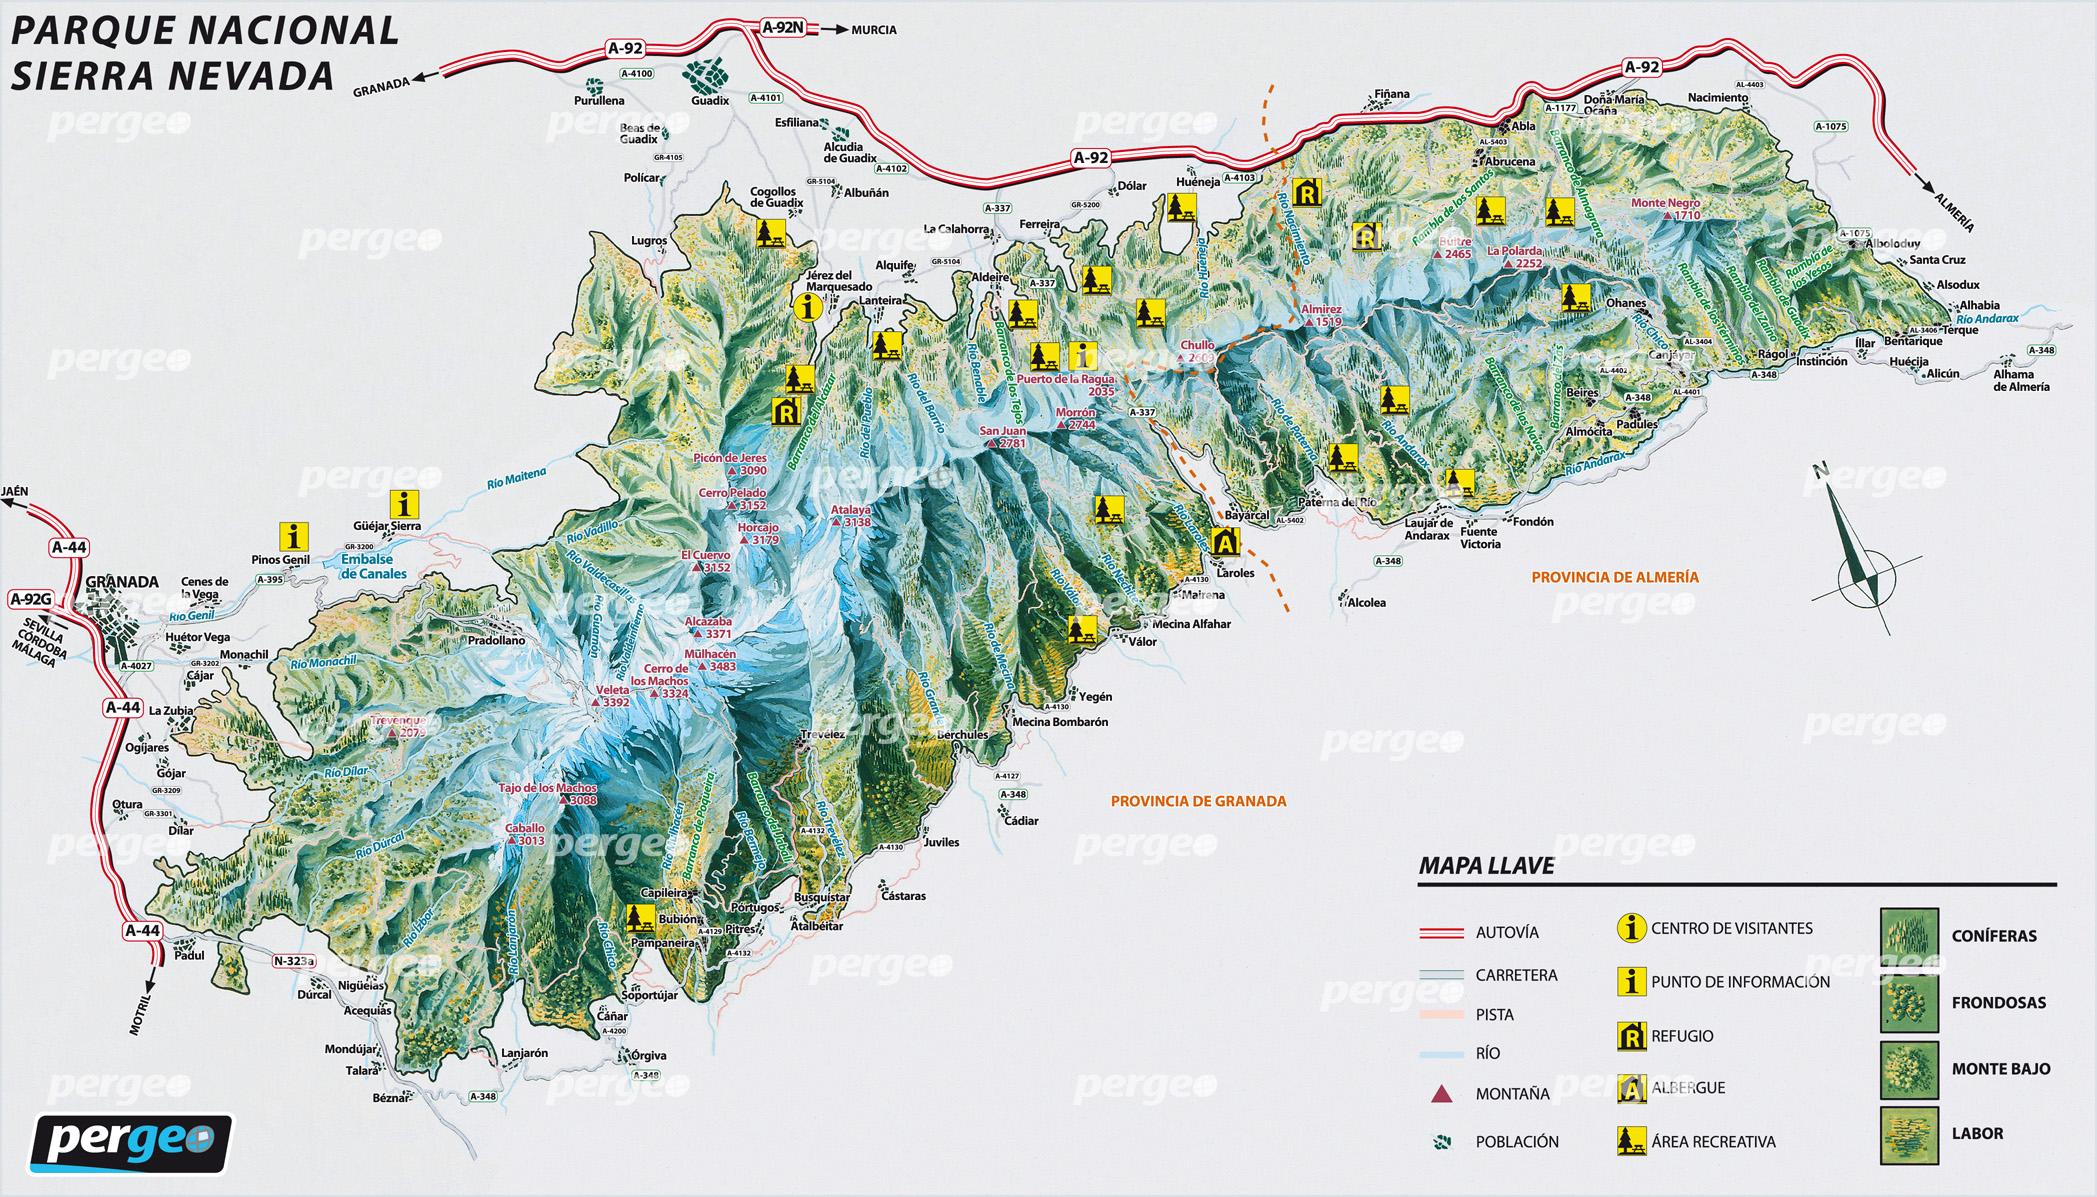 parque-nacional-sierra-nevada